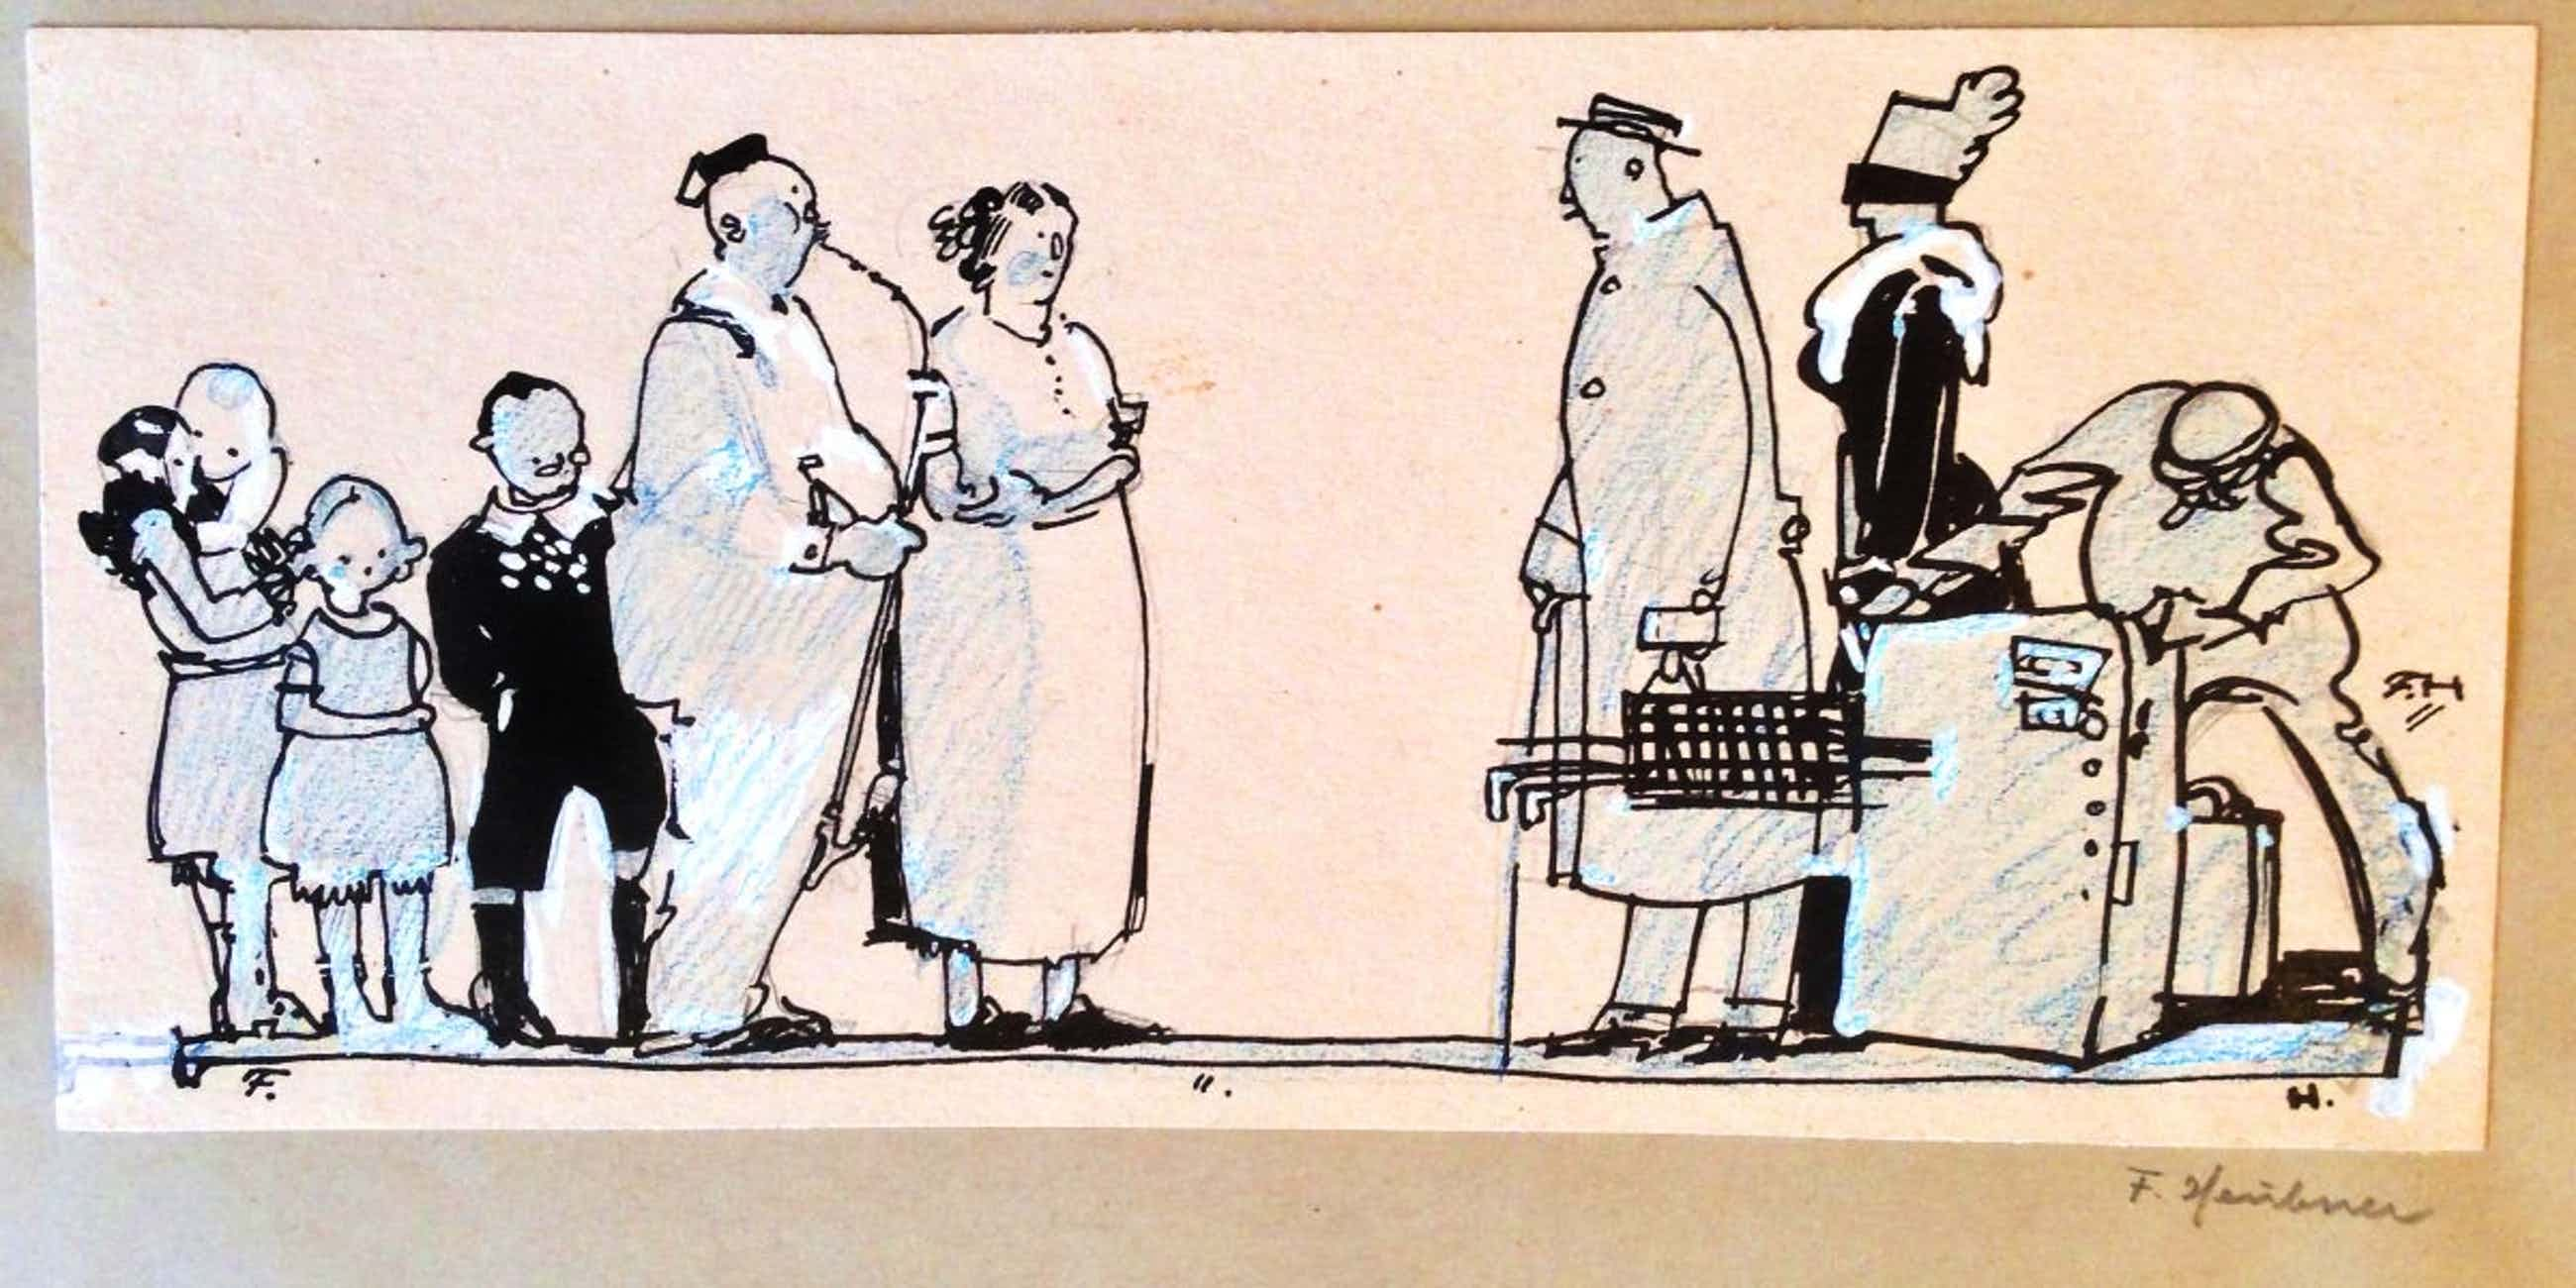 Fritz Heubner - Der willkommene Besuch, Karikatur kopen? Bied vanaf 380!